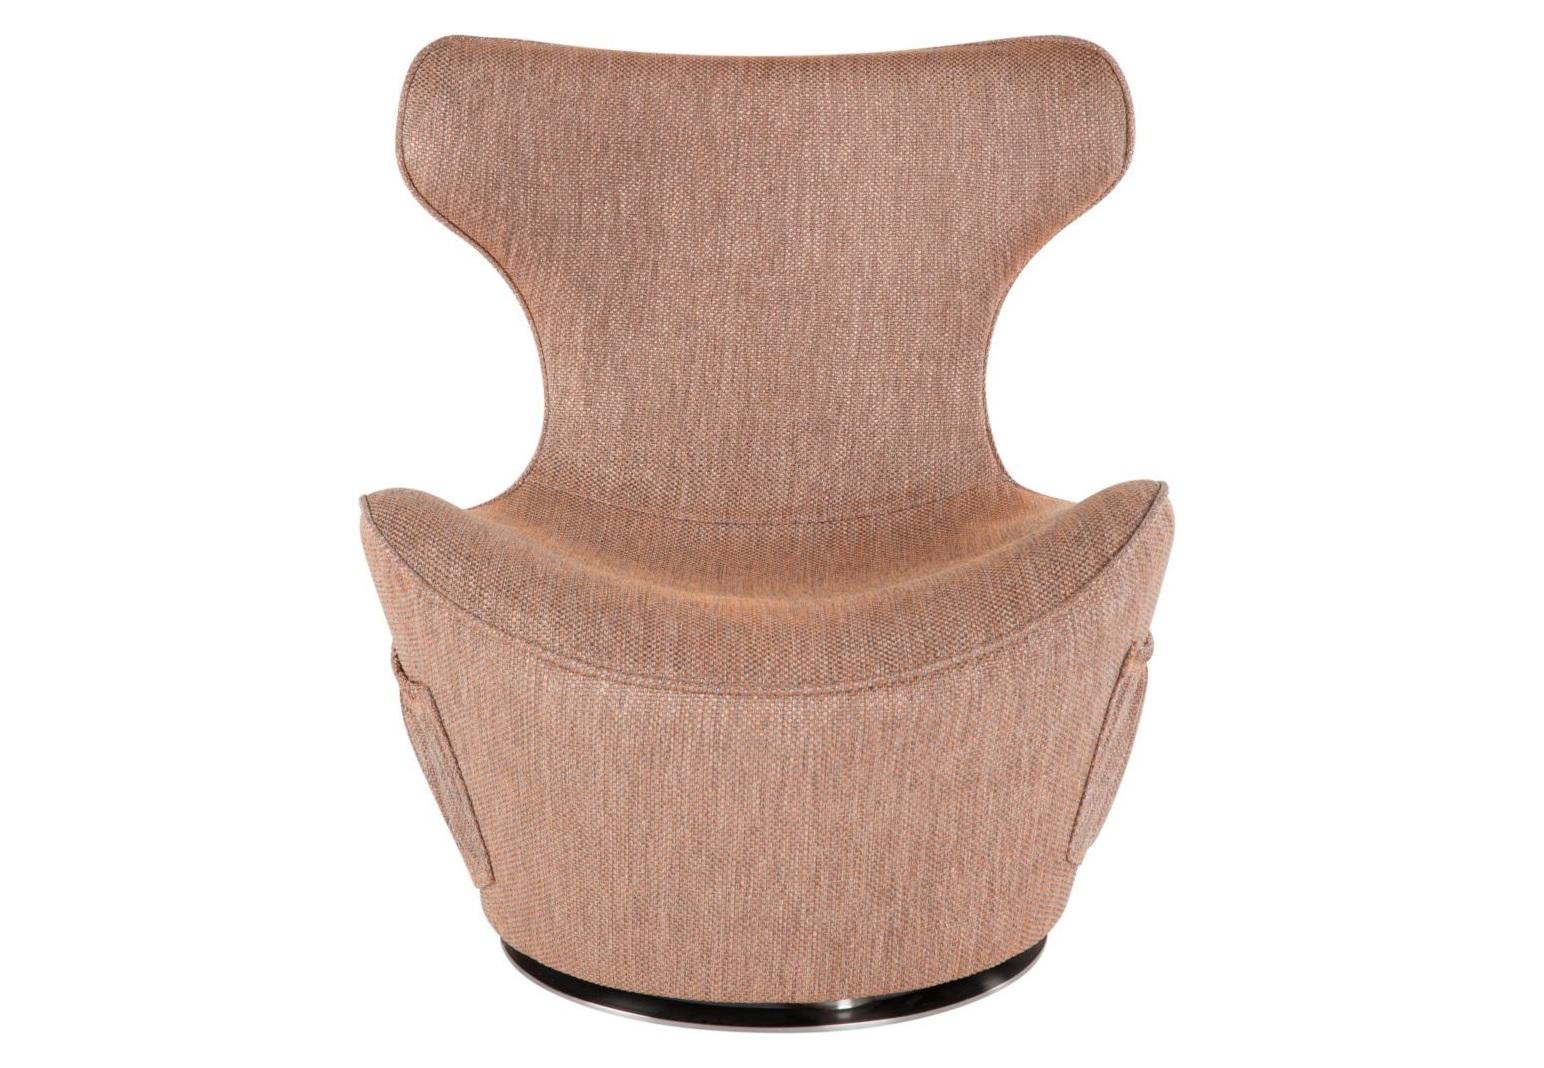 Кресло Limited EditionИнтерьерные кресла<br><br><br>Material: Текстиль<br>Width см: 75<br>Depth см: 74<br>Height см: 83